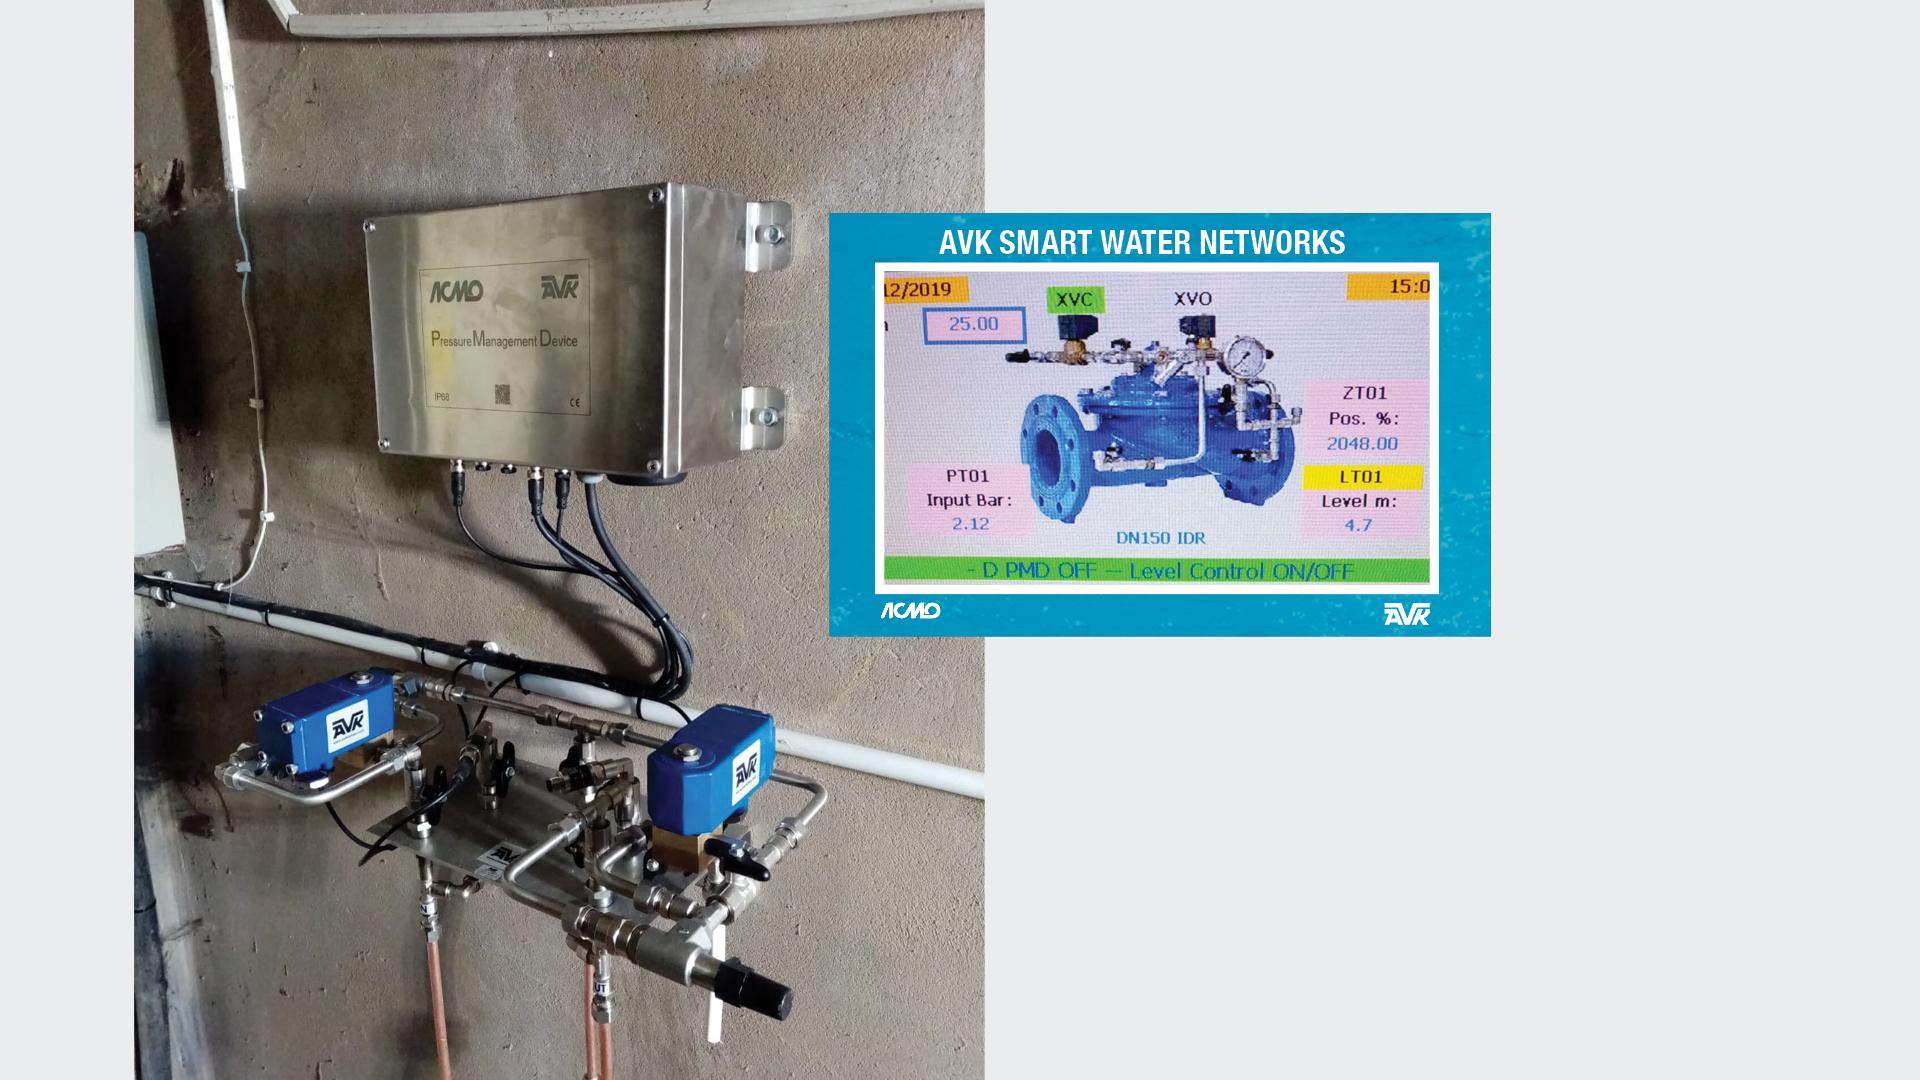 AVK Smart Water